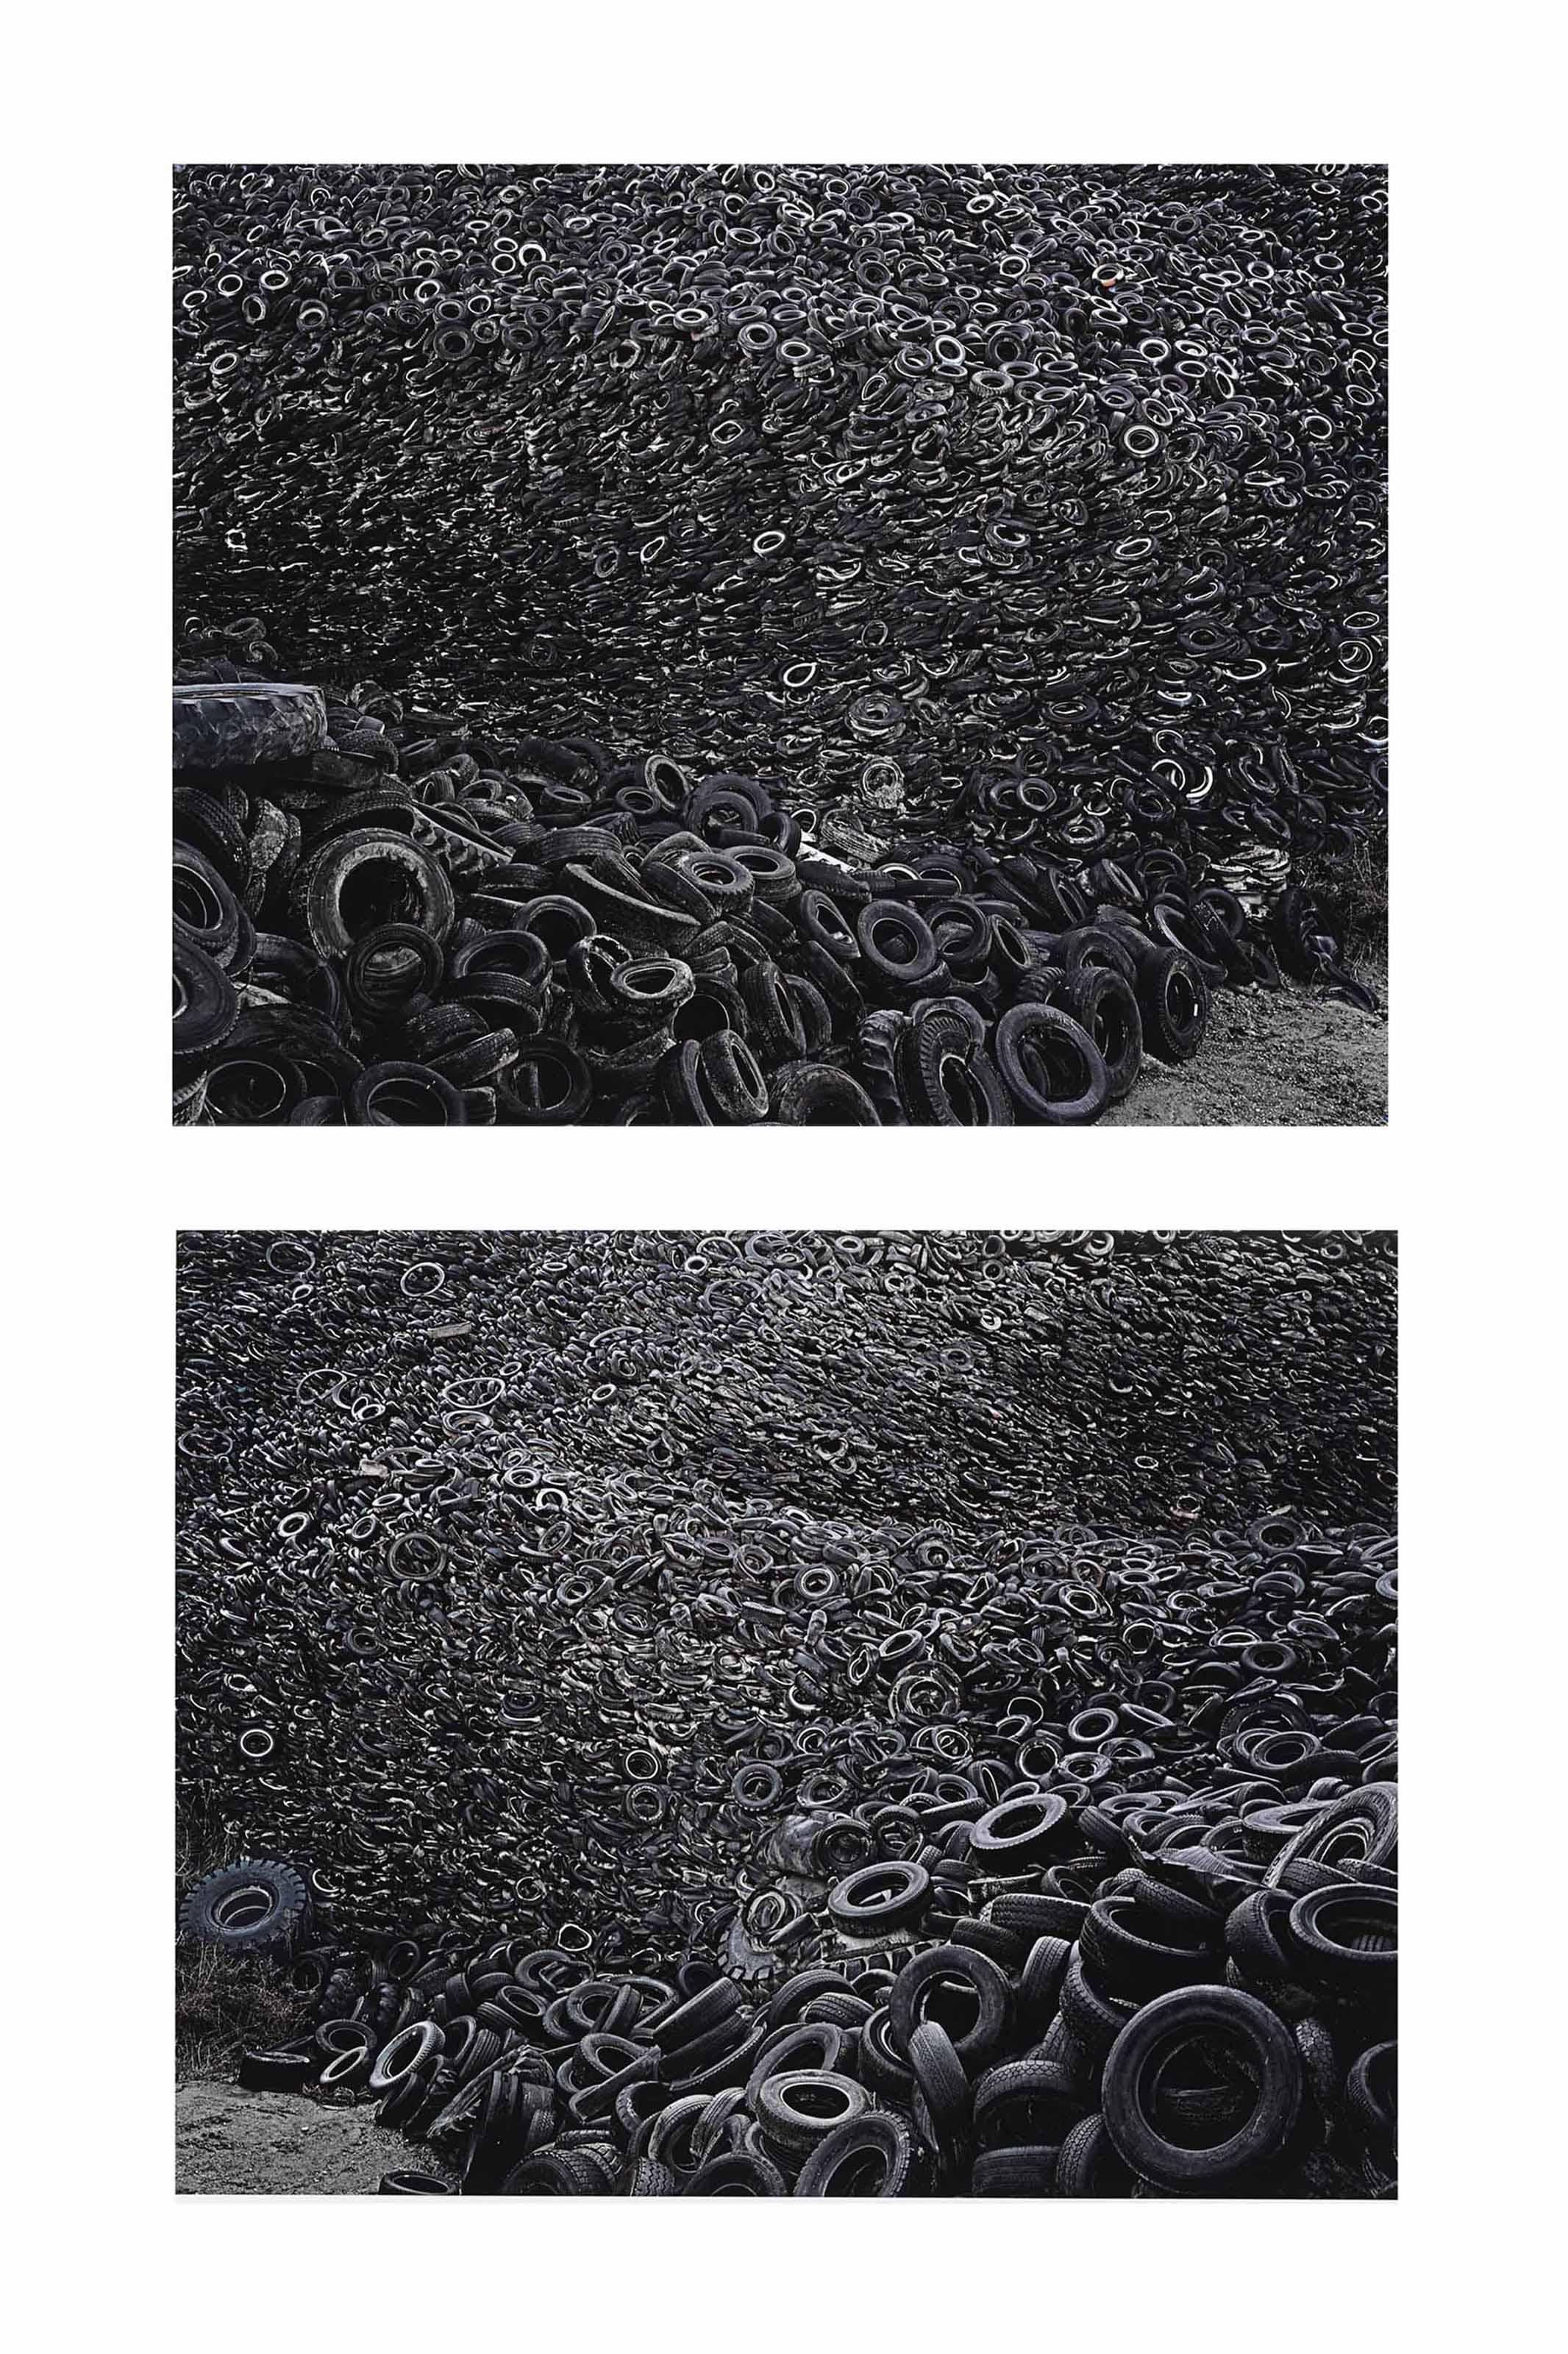 Oxford Tire Pile #9a & #9b, Westley, California, 1999